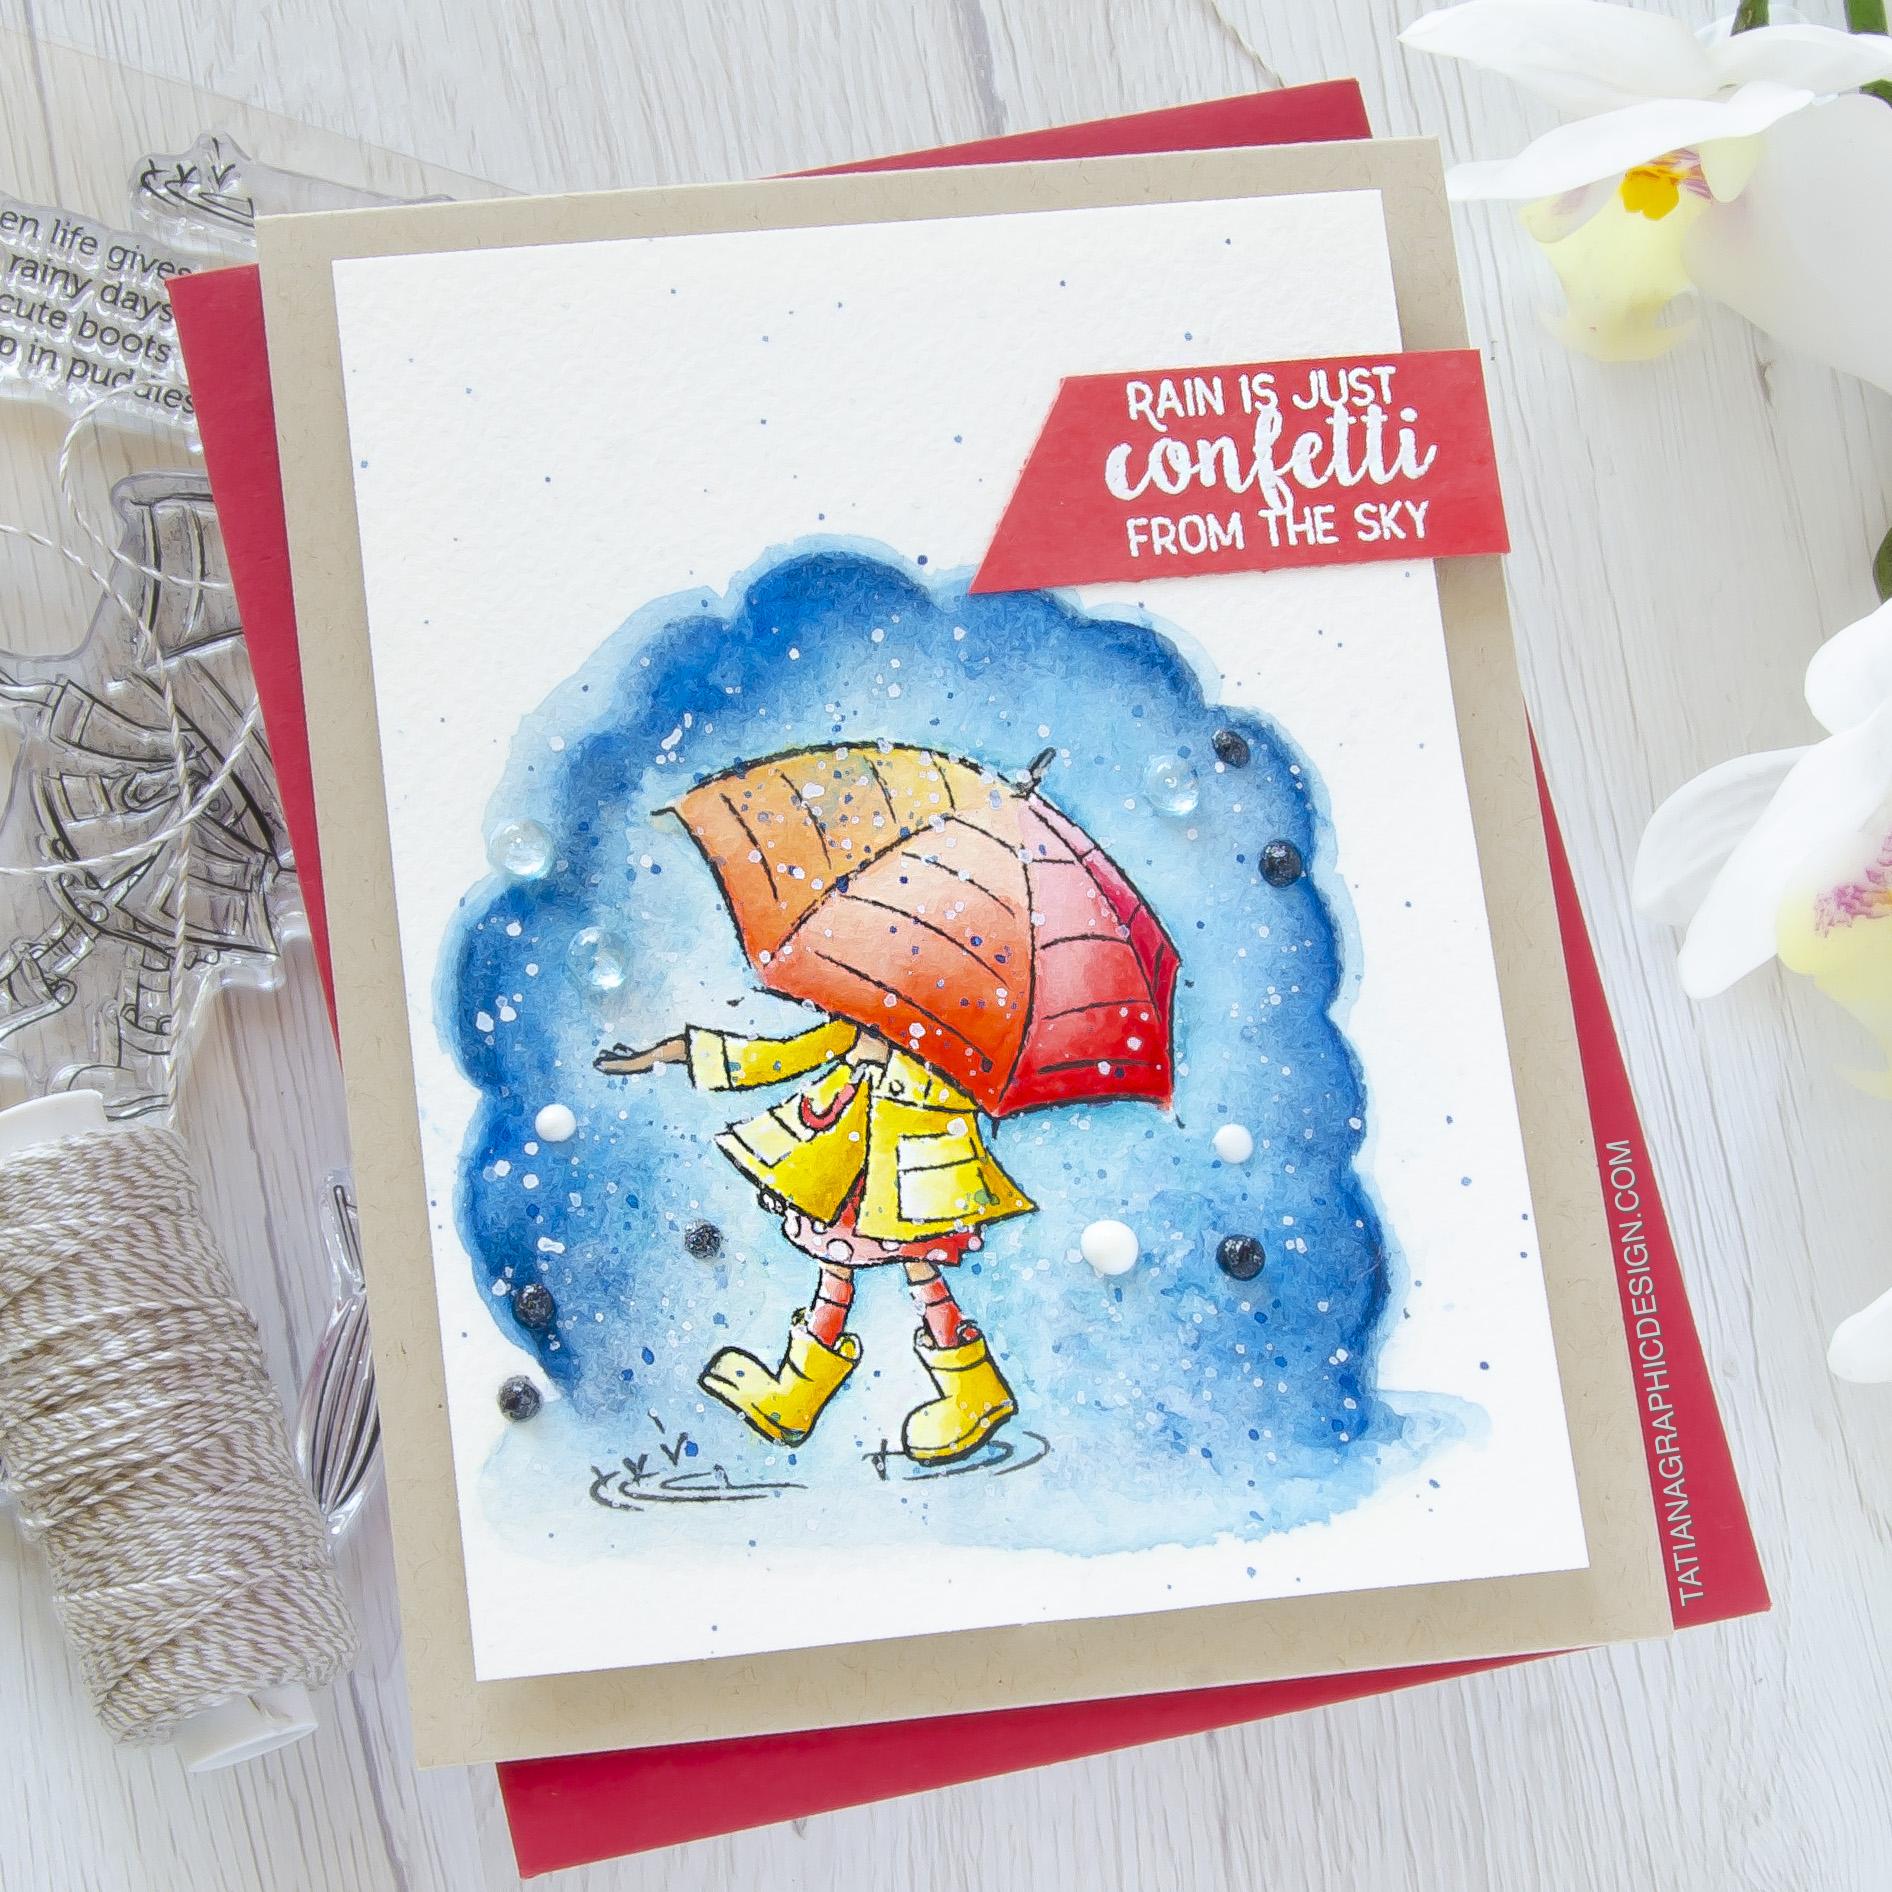 Rain Is Just Confetti From The Sky #handmade card by Tatiana Trafimovich #tatianacraftandart - Cute Boots stamp set by Spellbinders #spellbinders